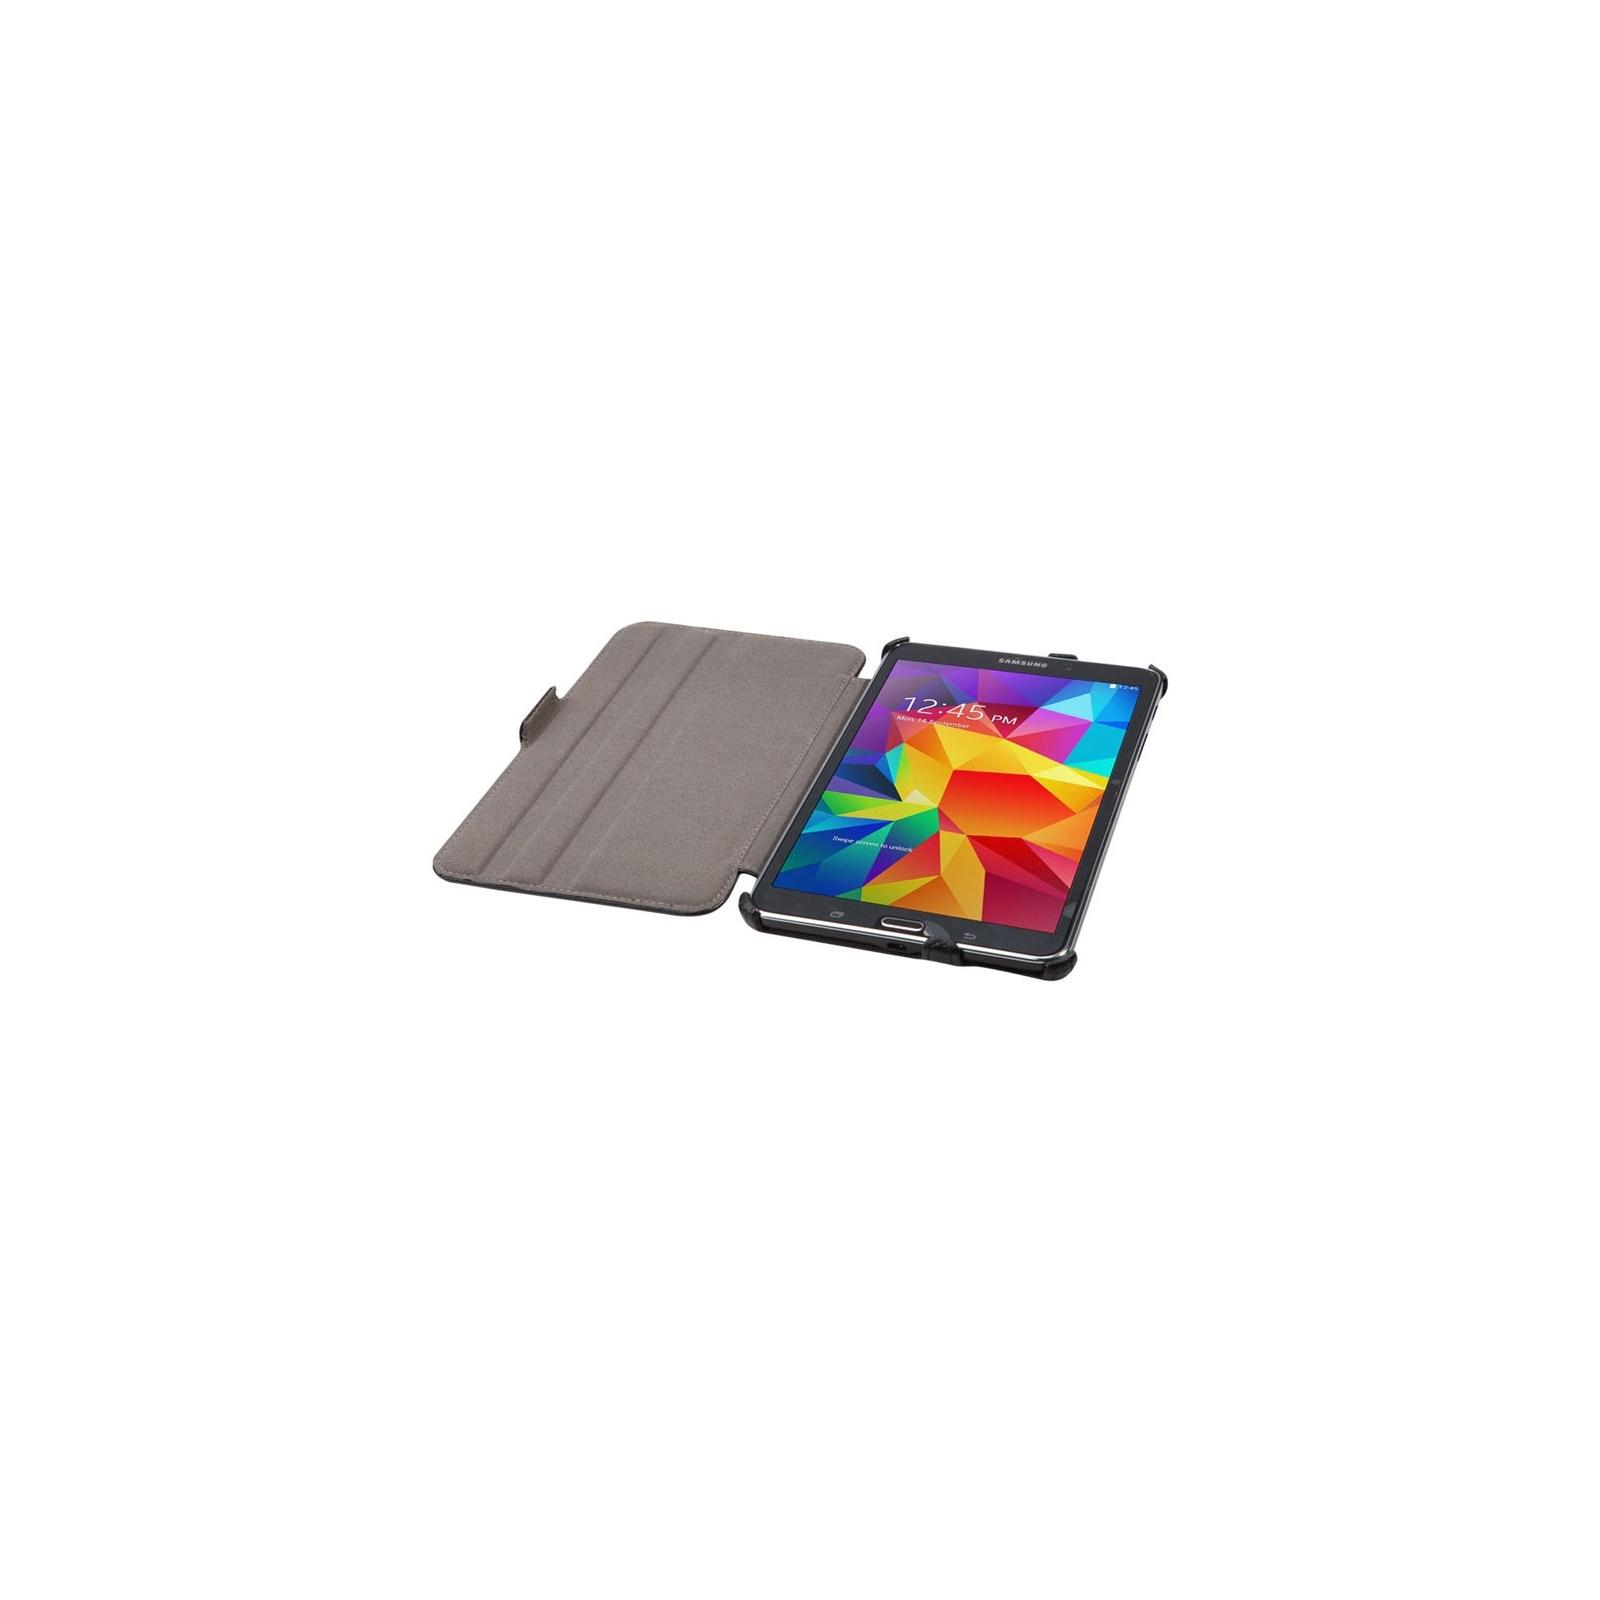 Чехол для планшета AirOn для Samsung GALAXY Tab 4 8.0 black (6946795850168) изображение 3